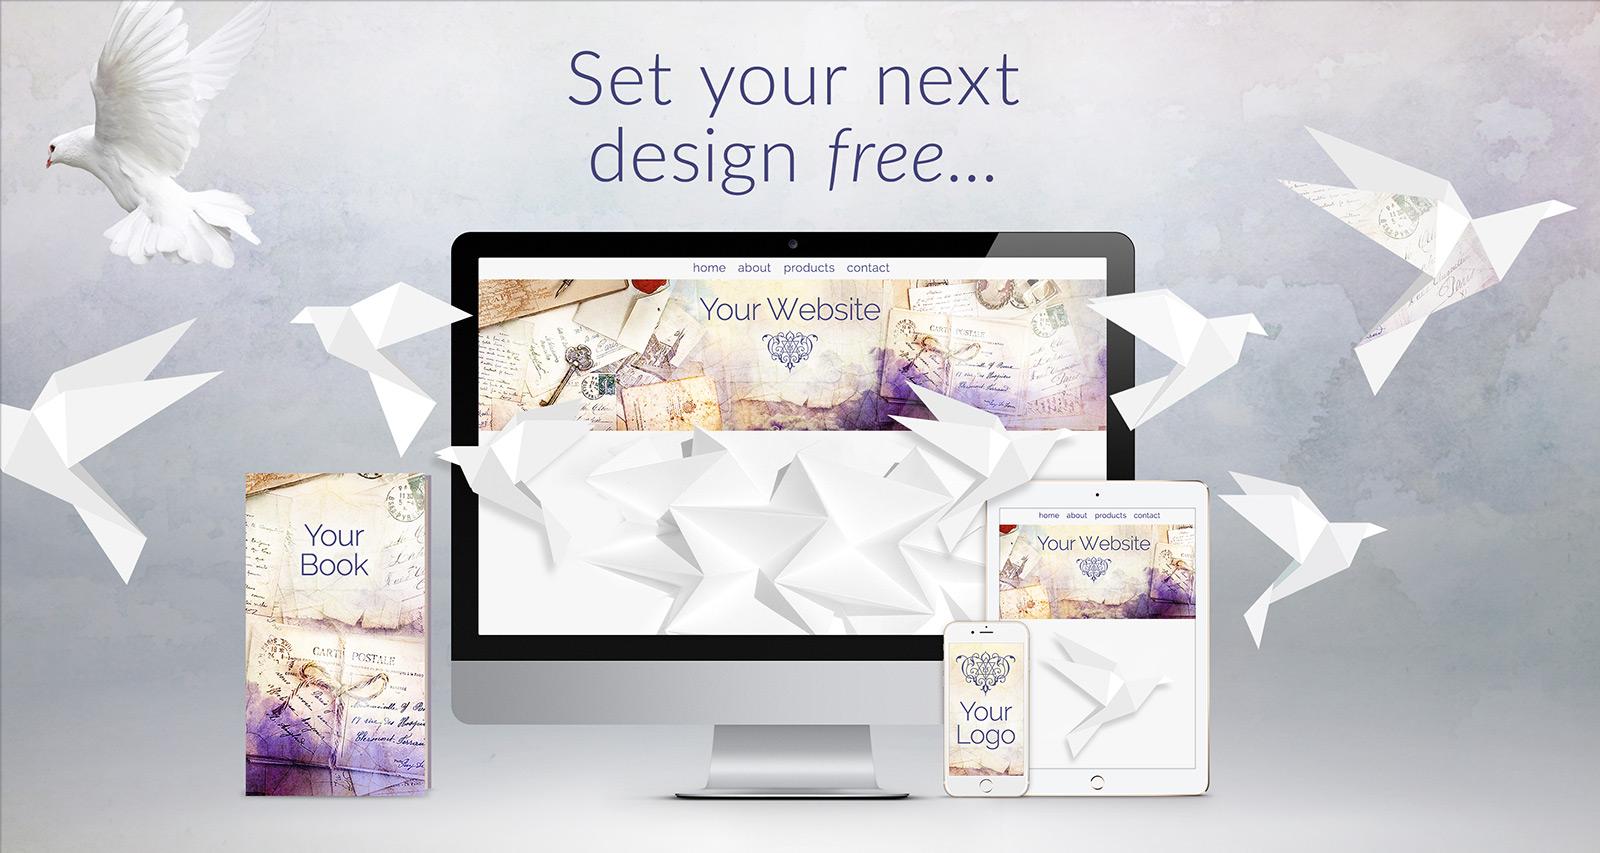 Set your next design free